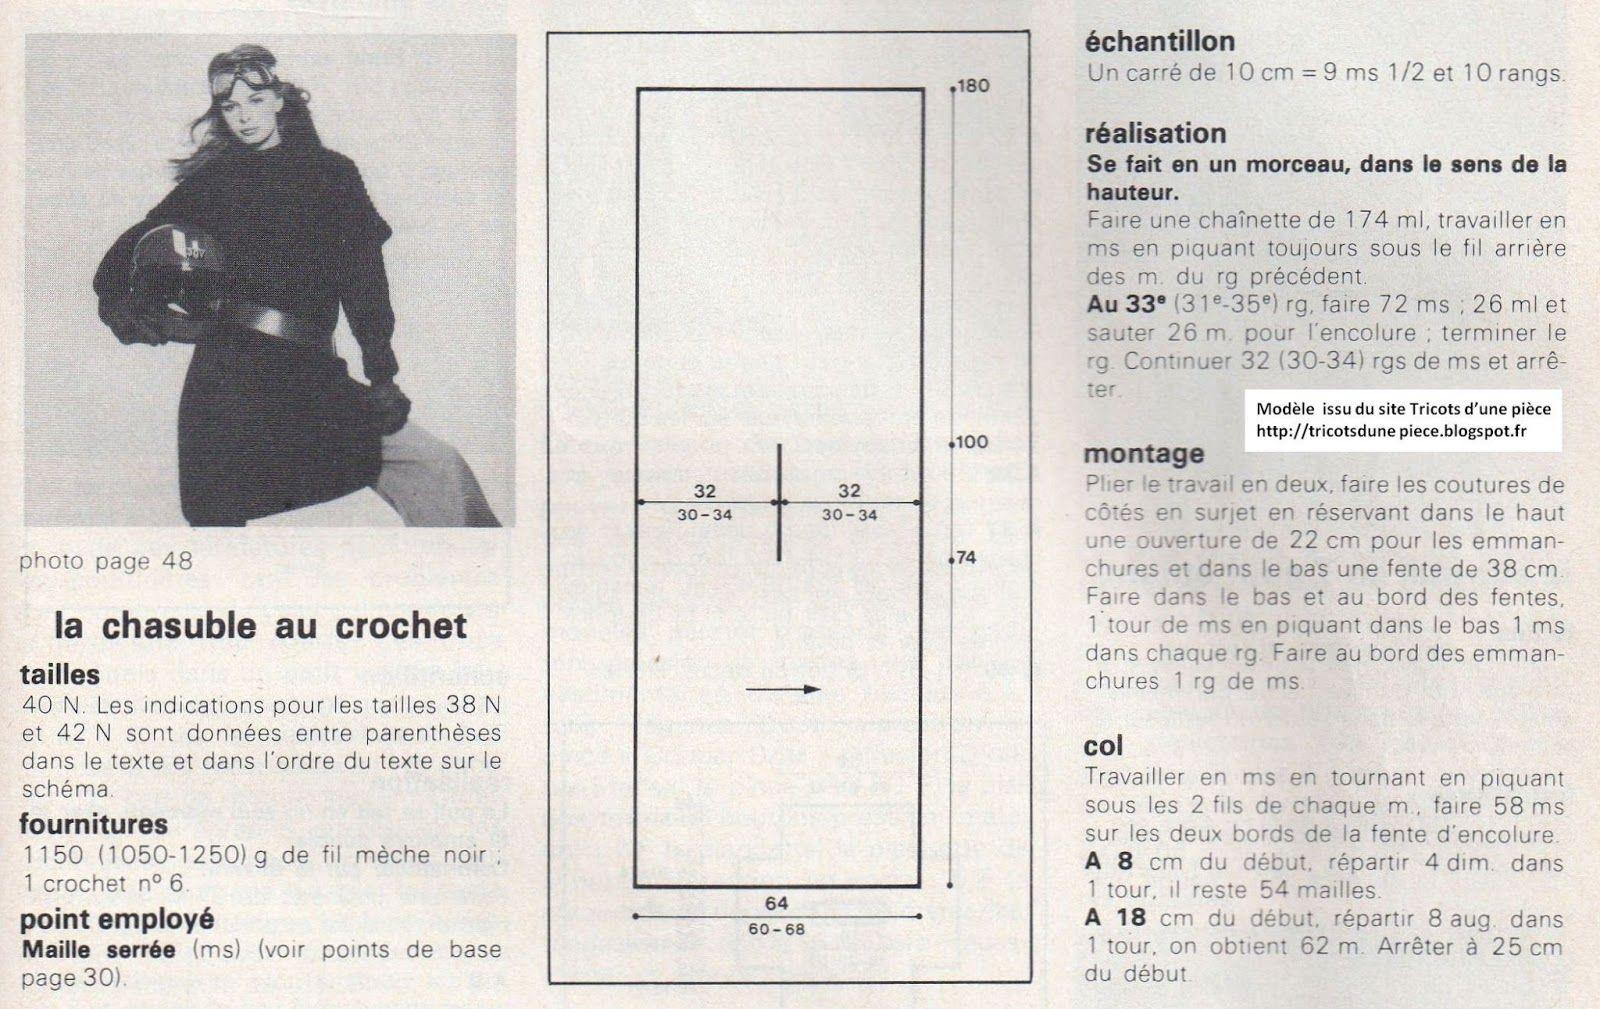 Crochet+Chasuble+au+crochet+1977+Mon+tricot+M+142-2.jpg (1600×1009)